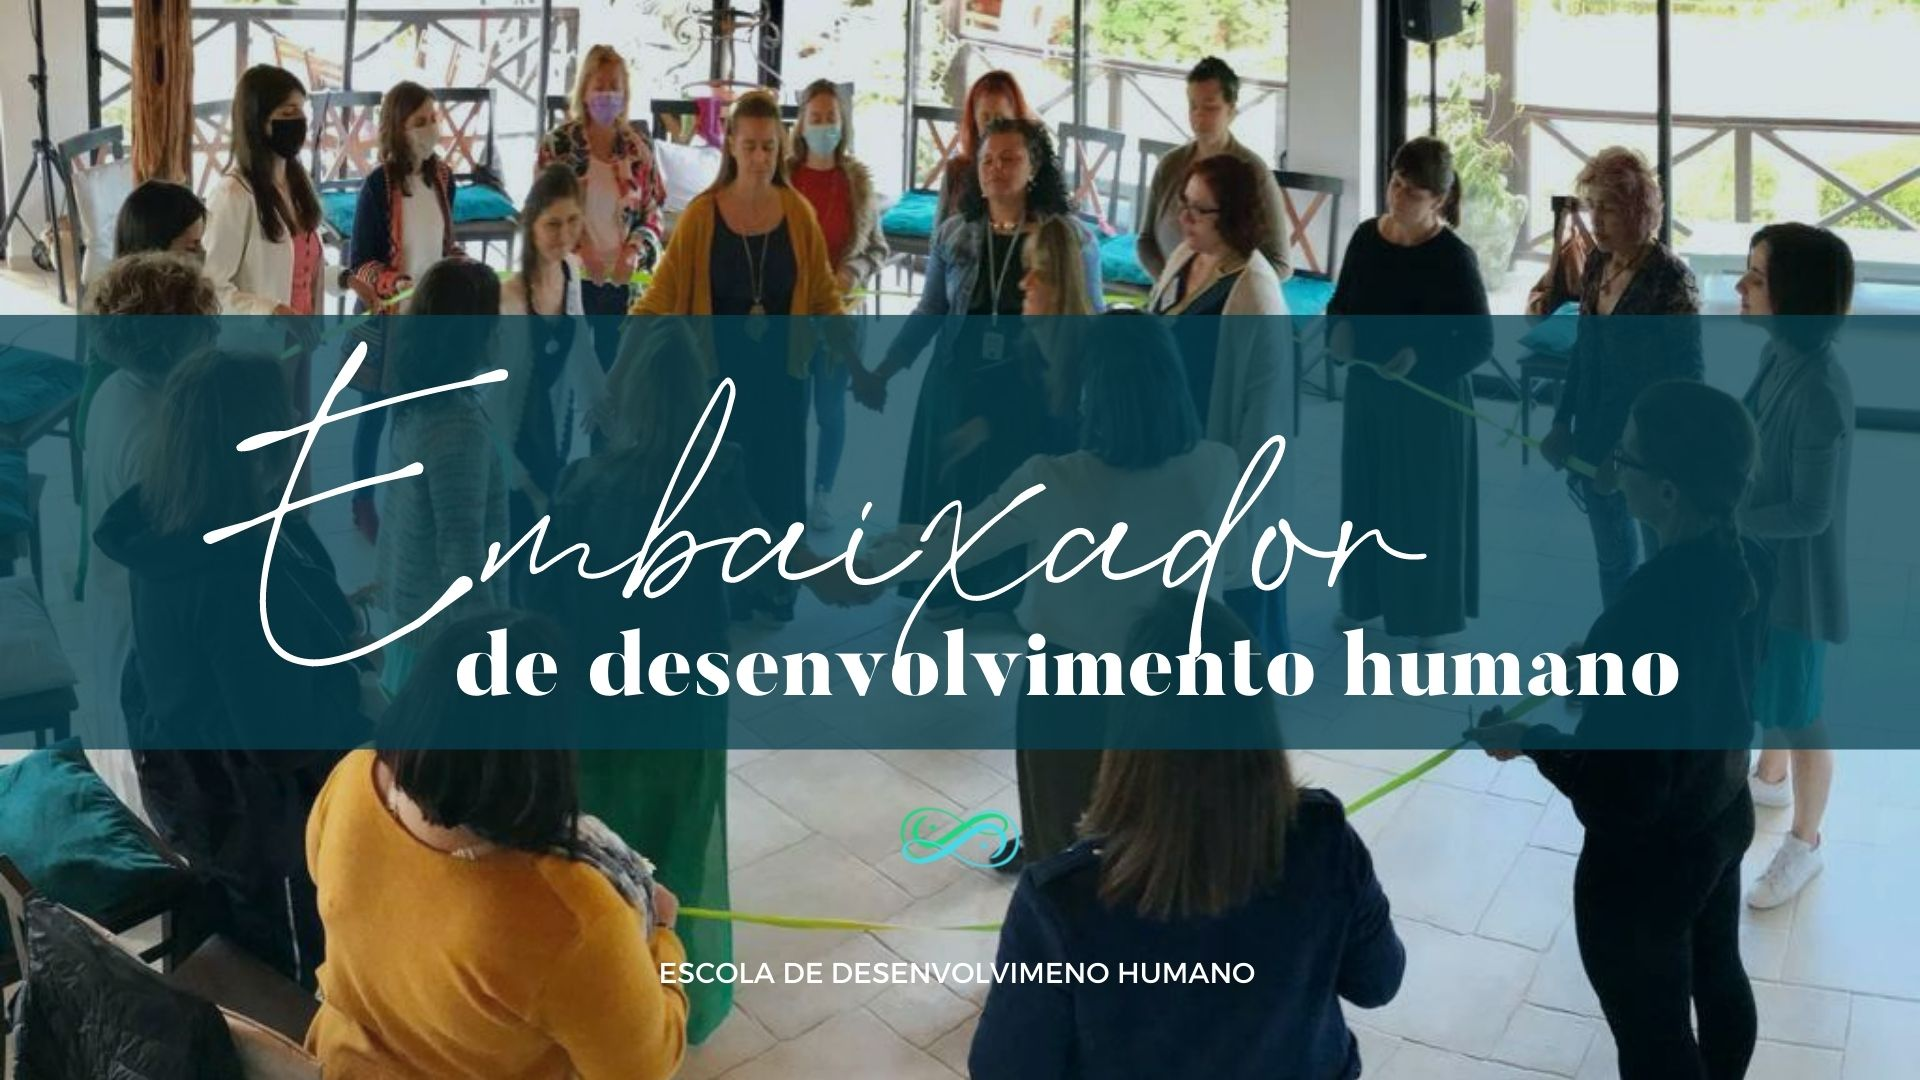 embaixadores de desenvolvimento humano